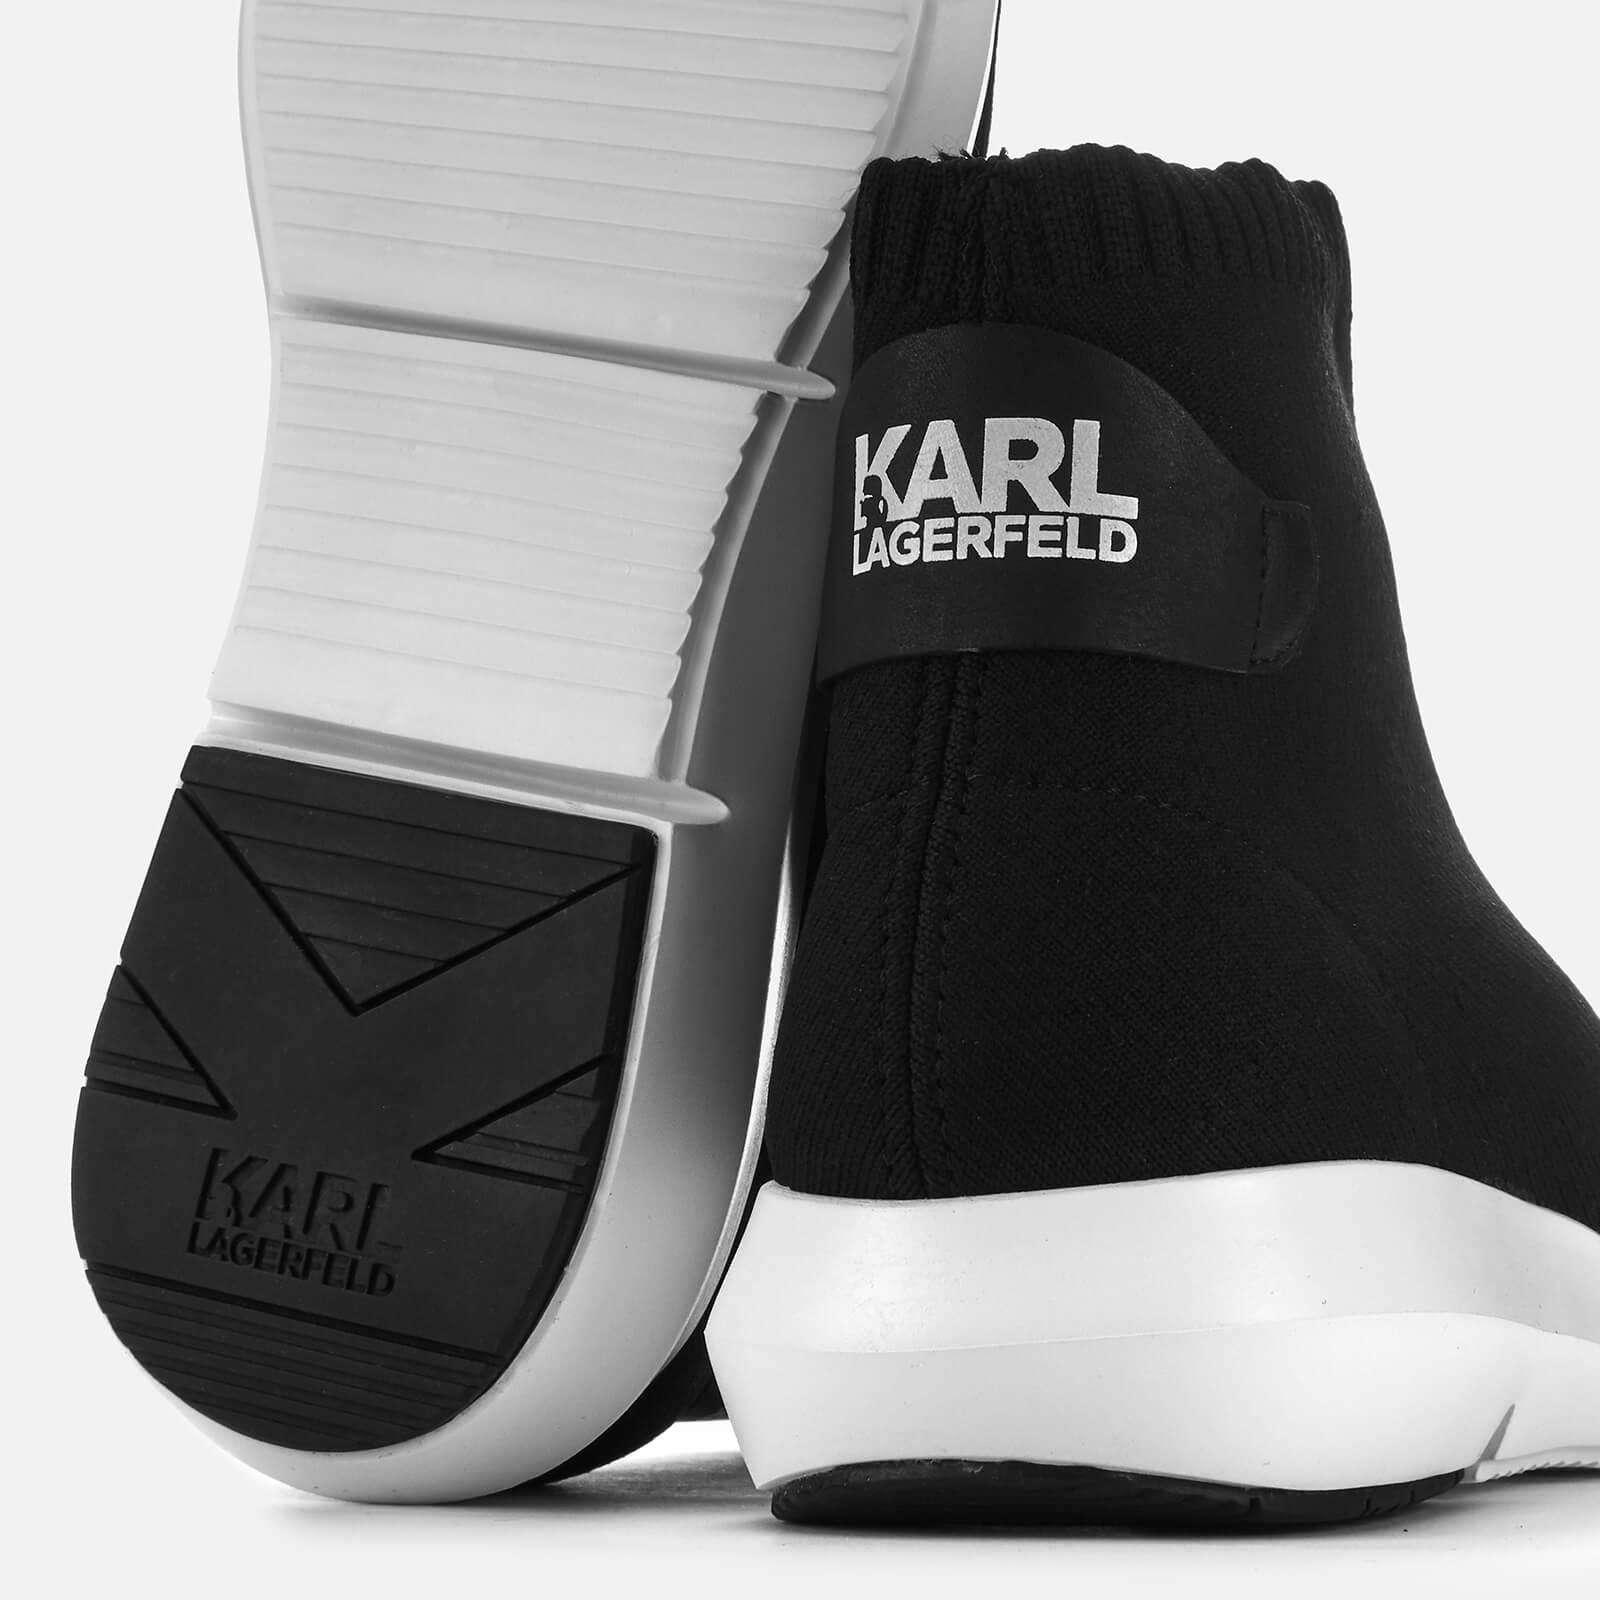 3d3ee2259833 Karl Lagerfeld - Black Vitesse Legere Knit Womens Trainer - Lyst. View  fullscreen